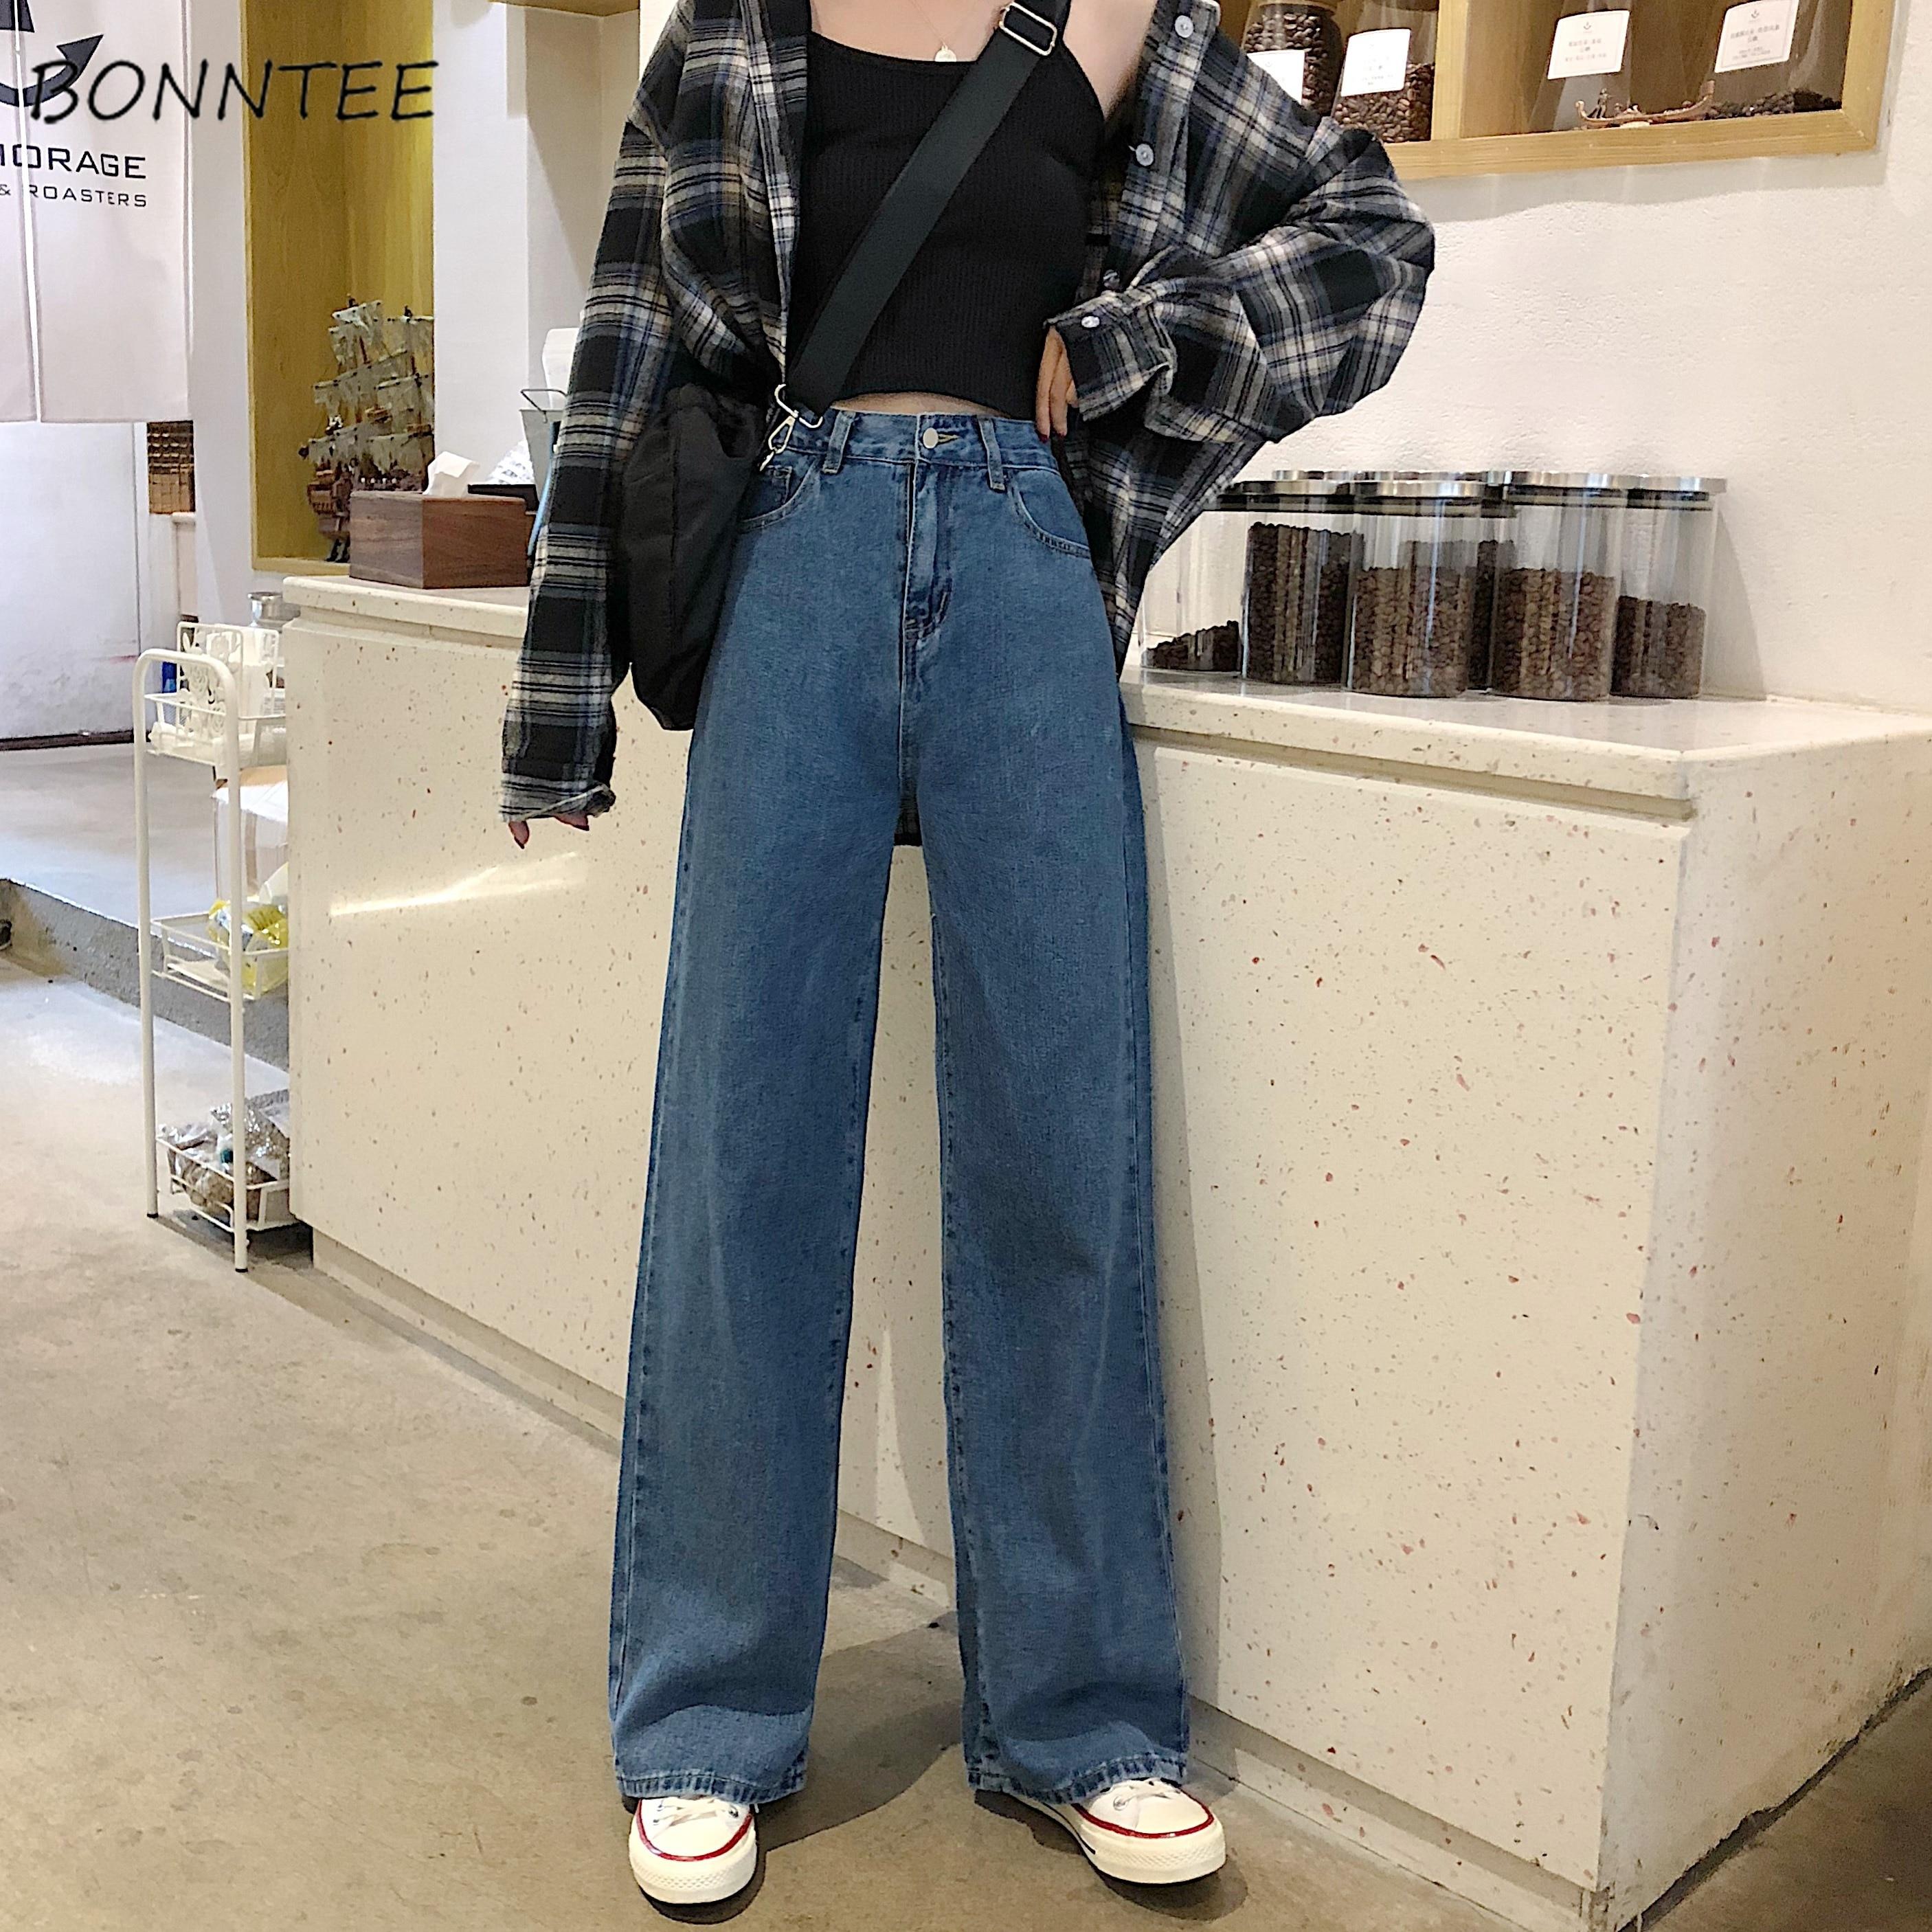 Jeans Women Denim Long Trousers Straight Korean Style Pockets Womens High Waist Casual Loose Students Streetwear Harajuku Chic